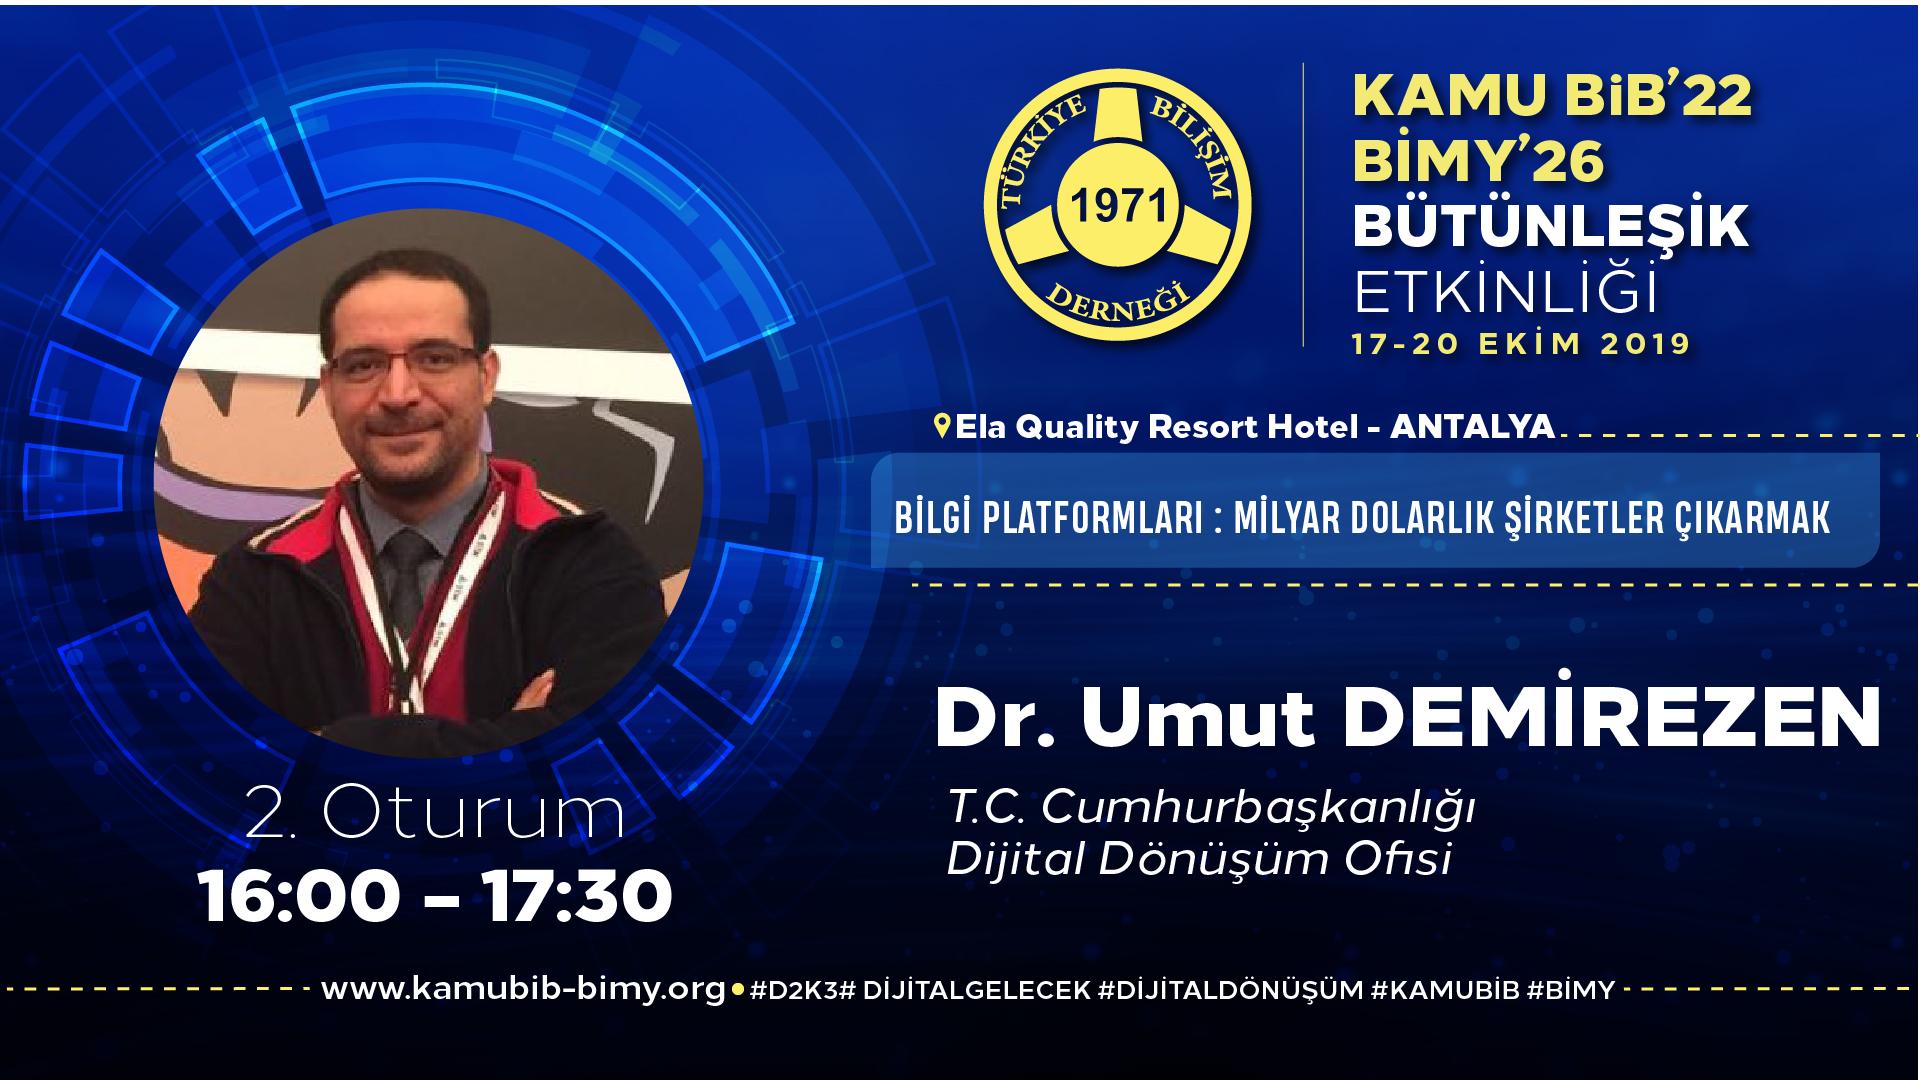 Dr. Umut DEMİREZEN - KamuBİB'22 BİMY'26